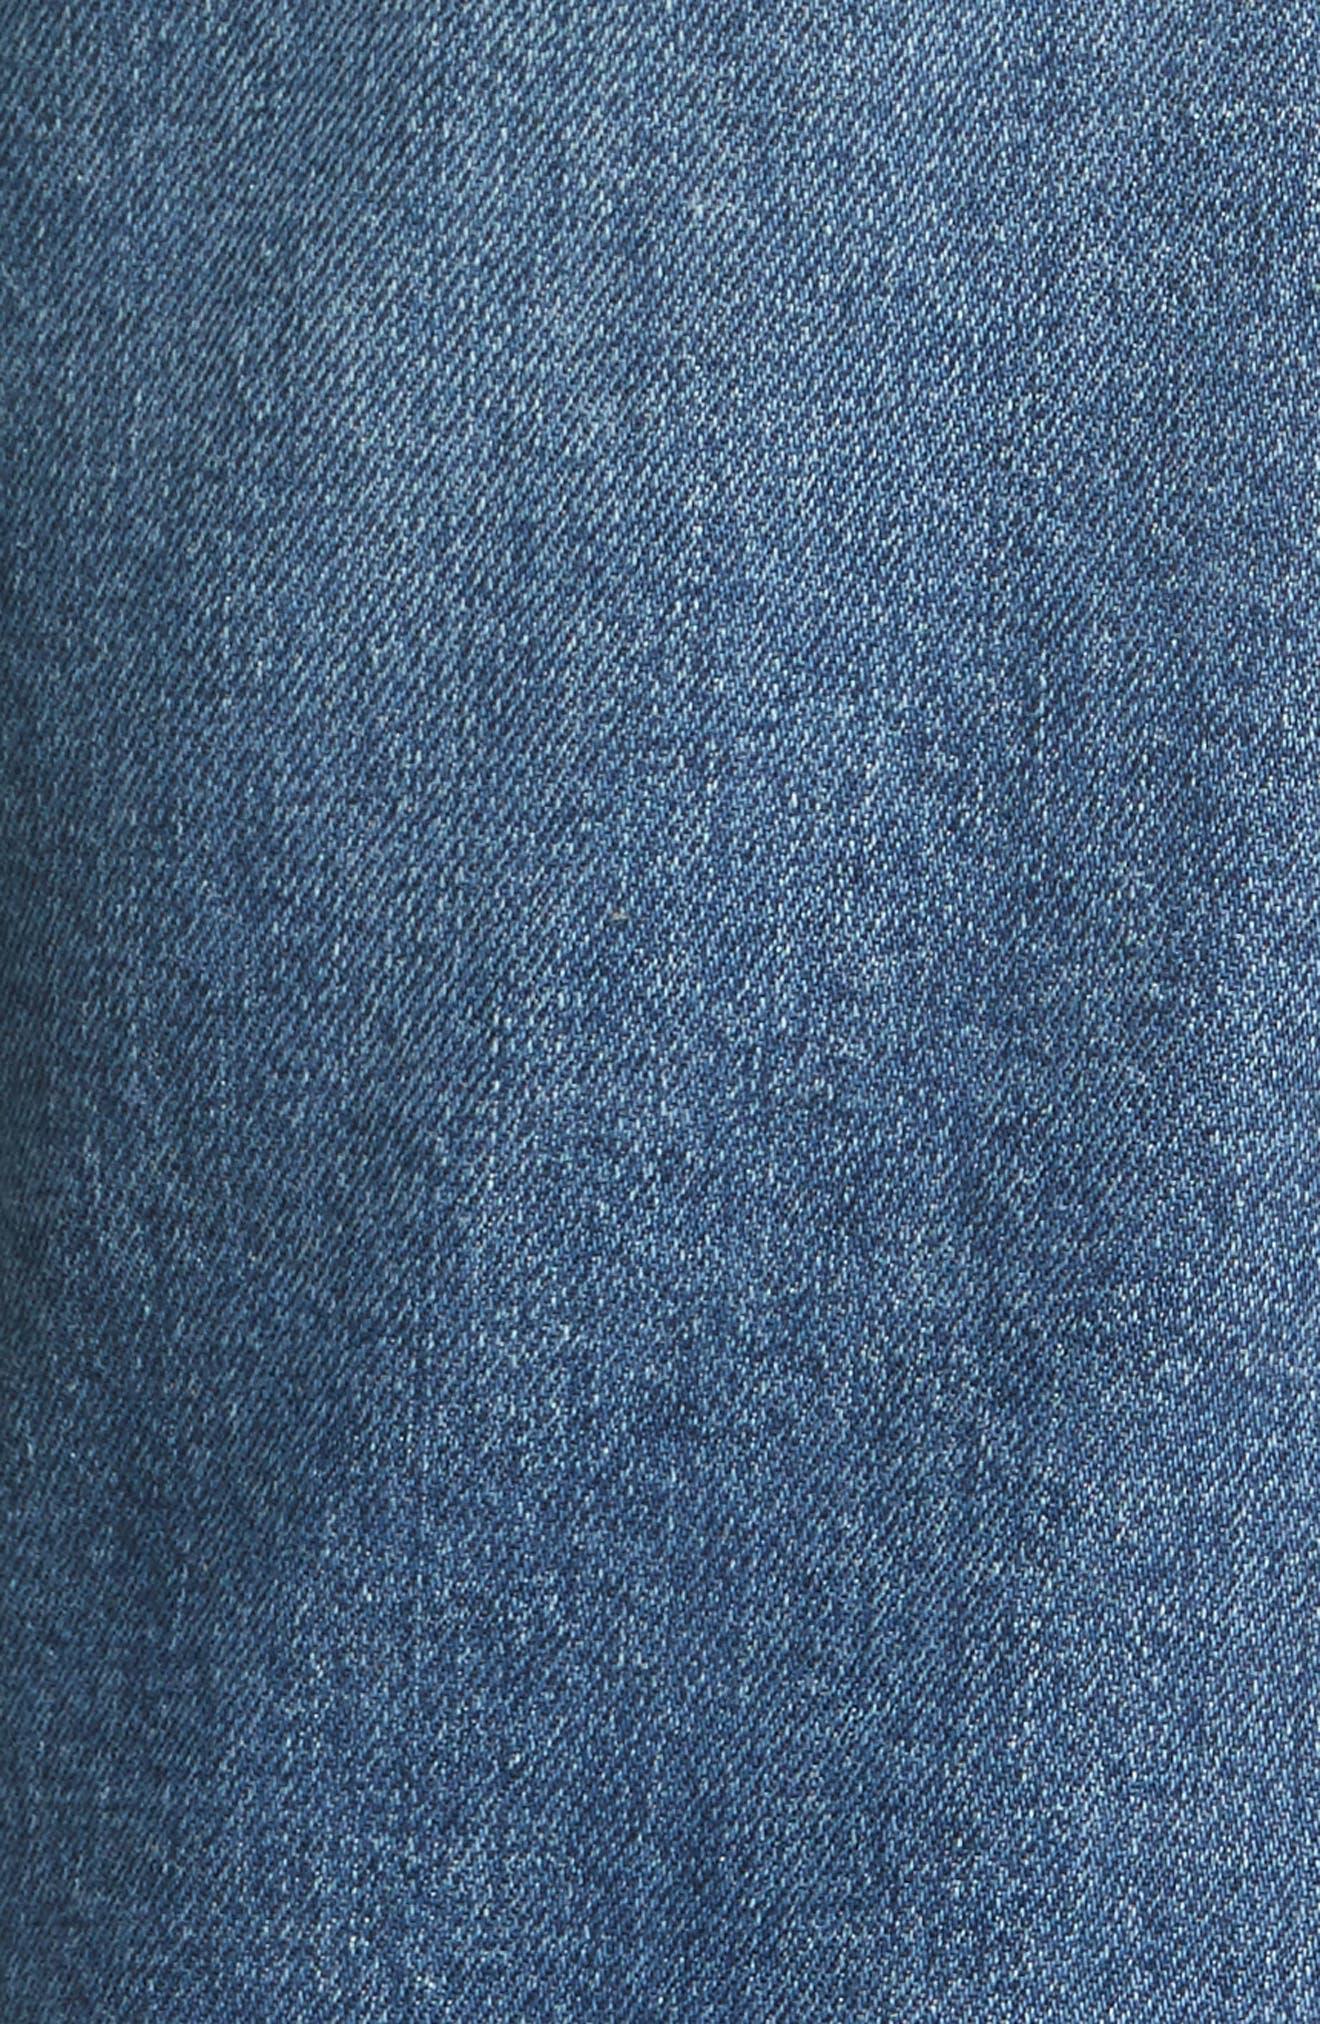 River Slim Taper Jeans,                             Alternate thumbnail 5, color,                             MID BLUE